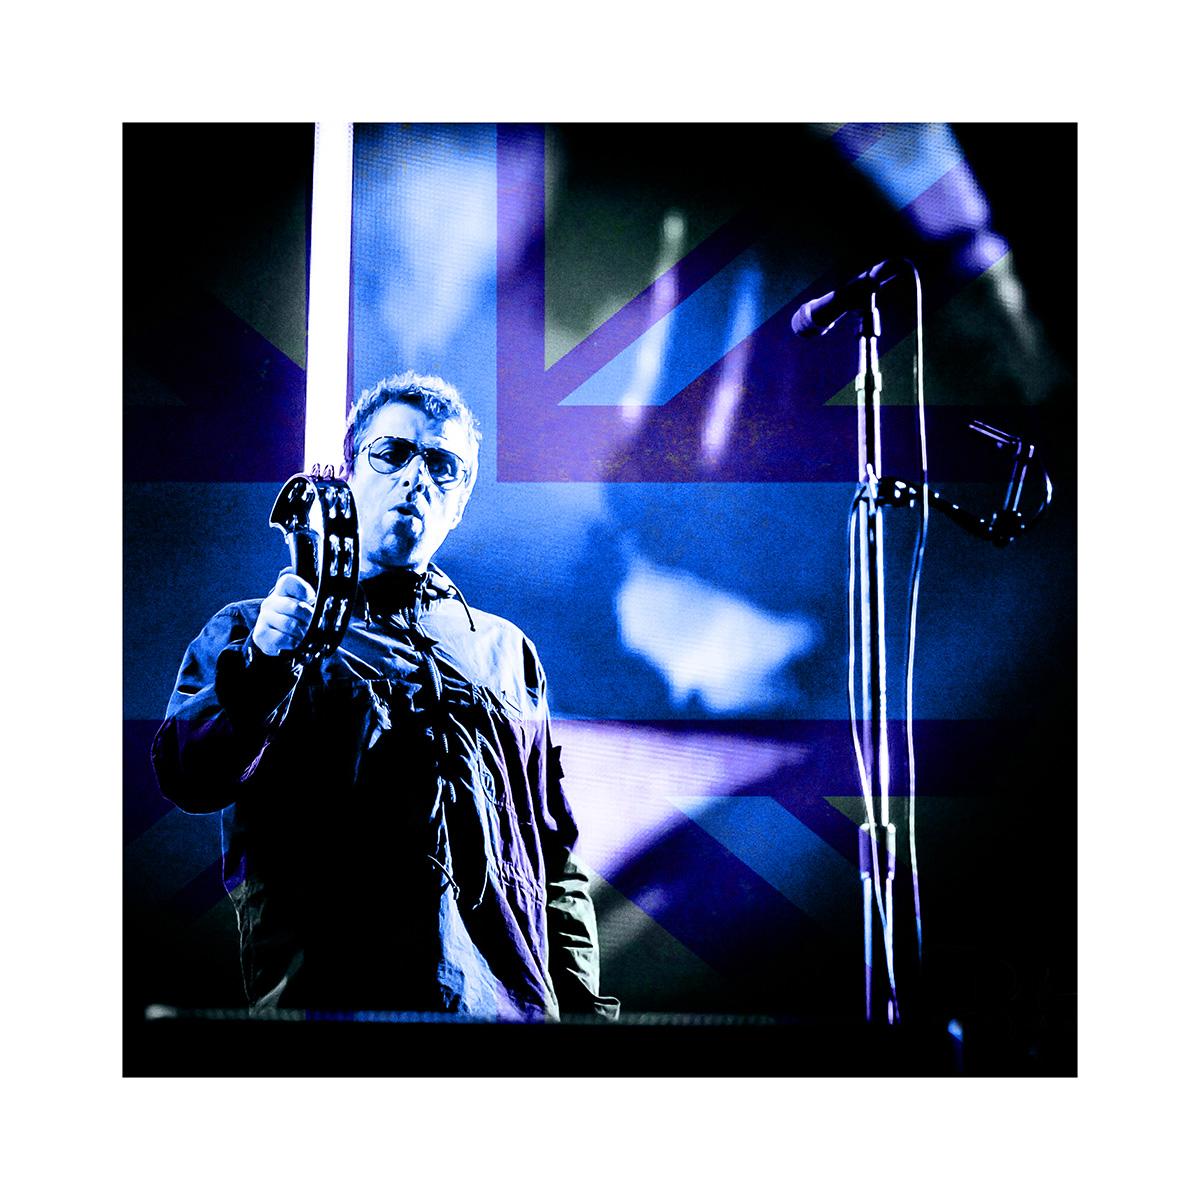 "LIAM GALLAGHER BLUE LTD EDITION PRINT 16""x20"" £195  24""x30"" £295.00  32""x40"" £395.00"